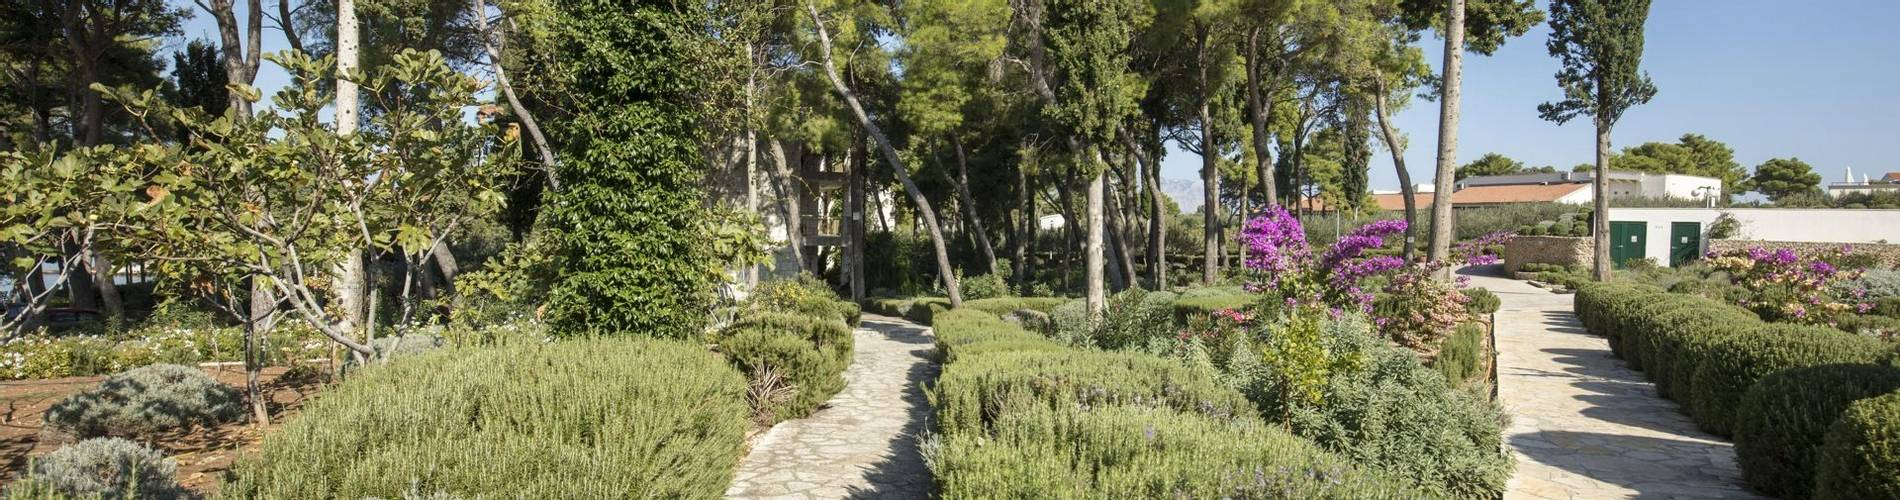 07 Resort_Velaris - Garden (5) (1).jpg